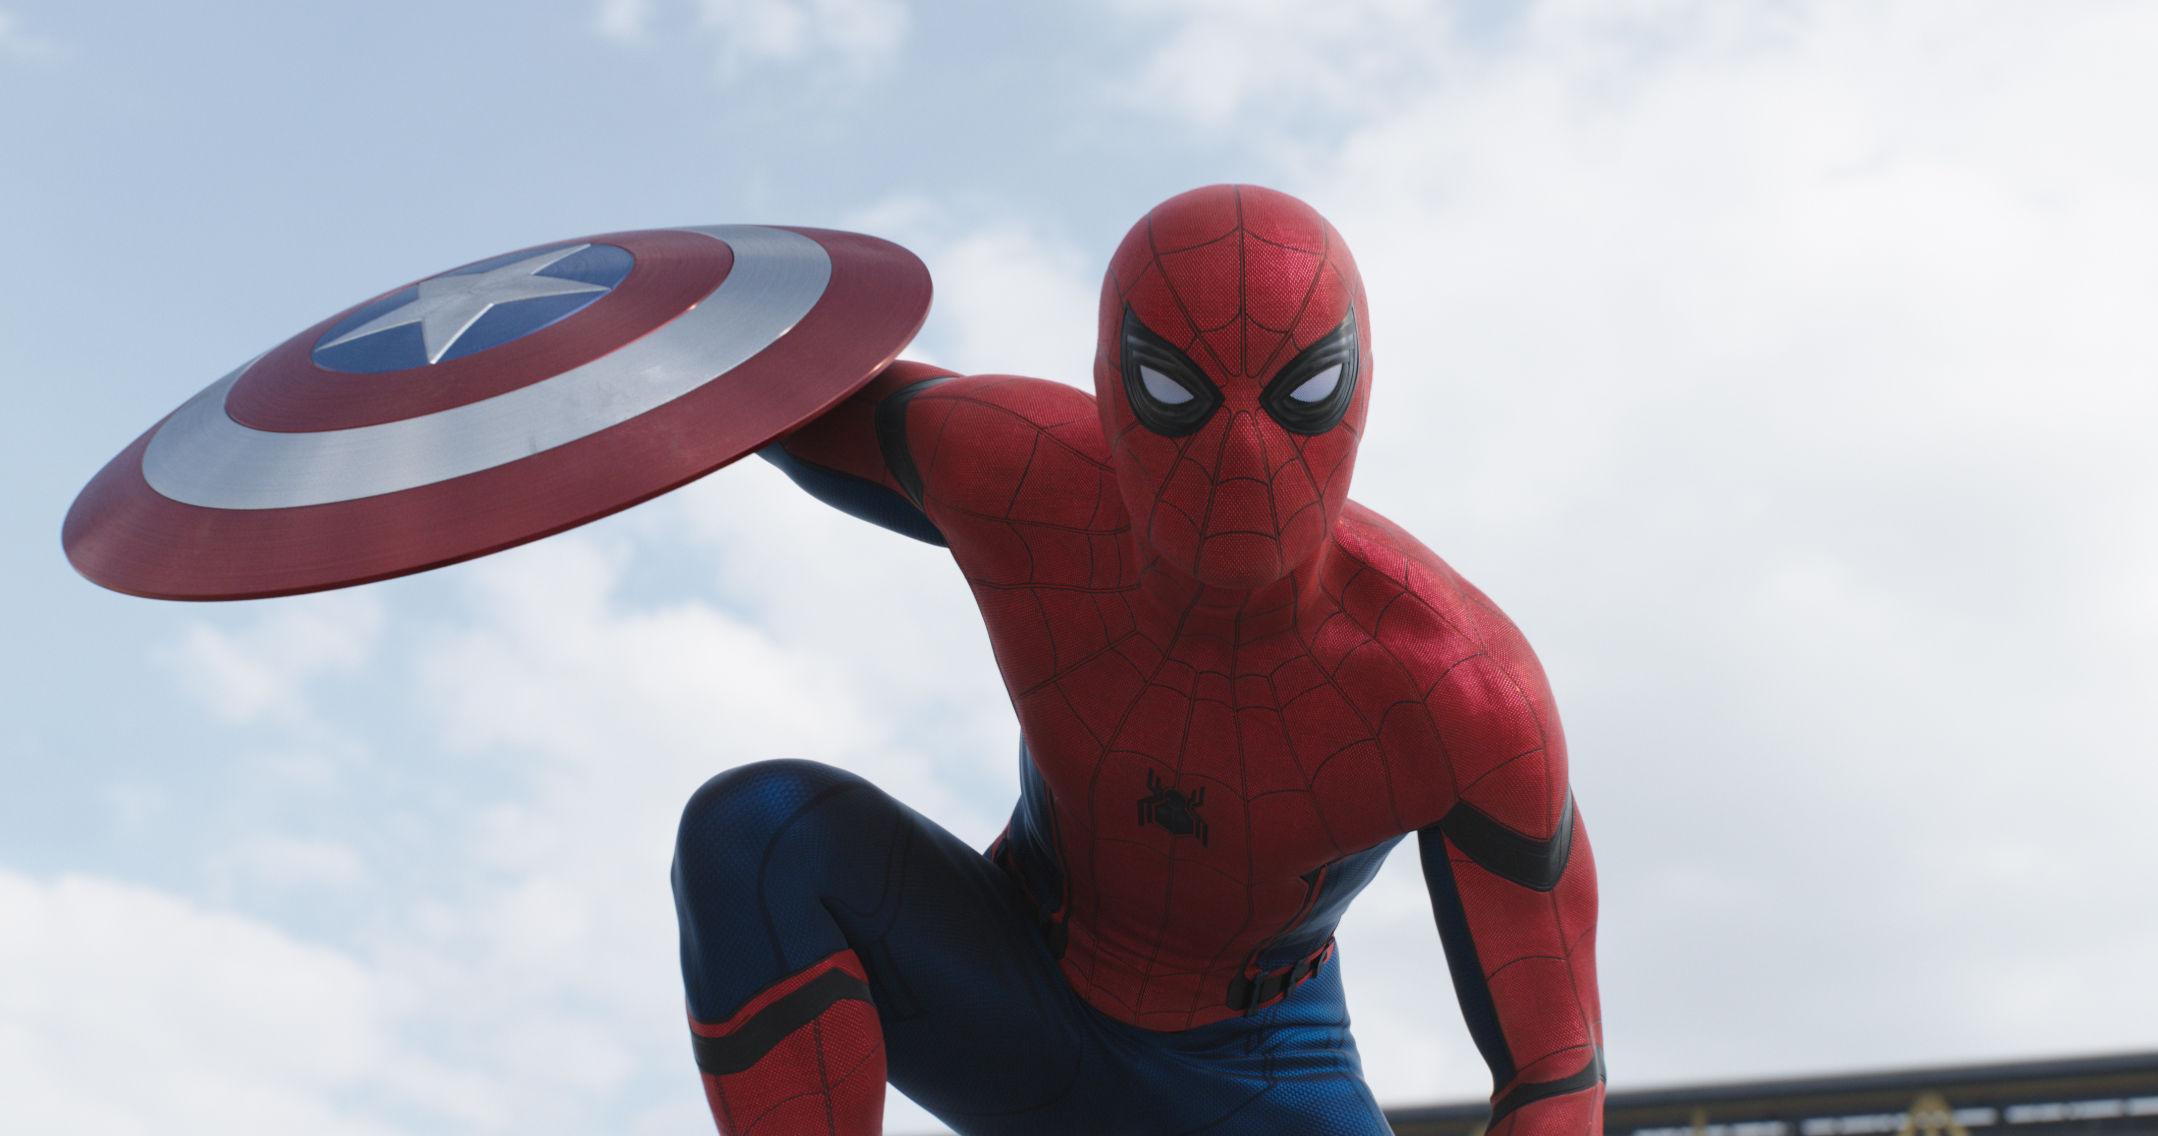 http://screenrant.com/wp-content/uploads/Captain-America-Civil-War-Spider-Man-Costume-Eyes-Official.jpg